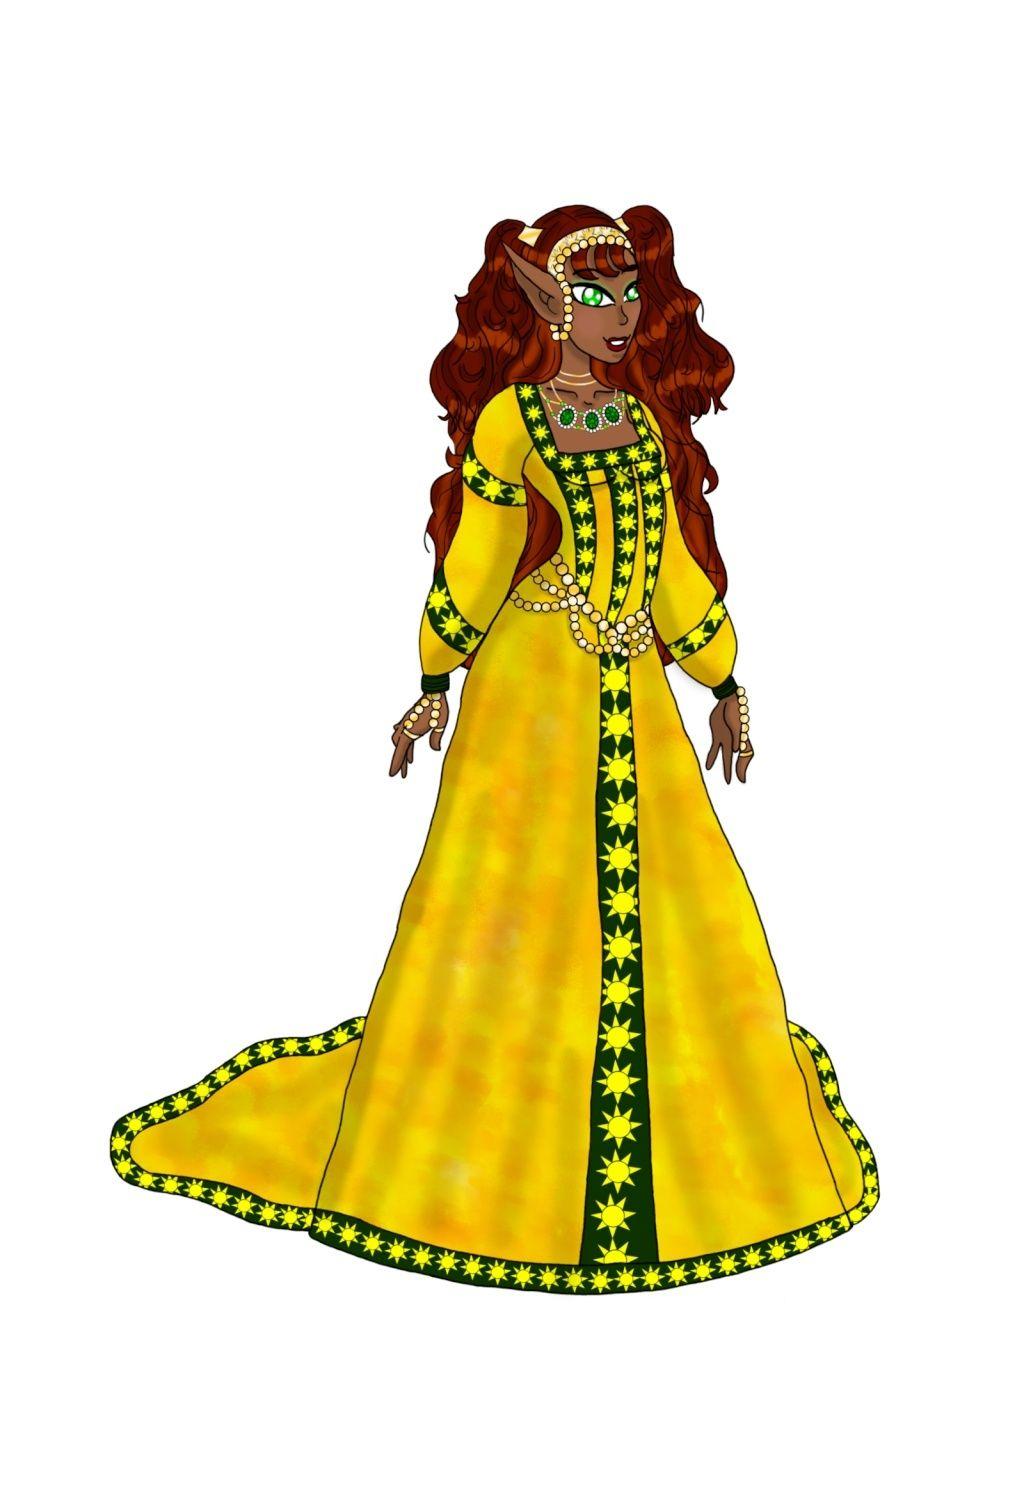 Vaeri's Colorings and Art Crown_10